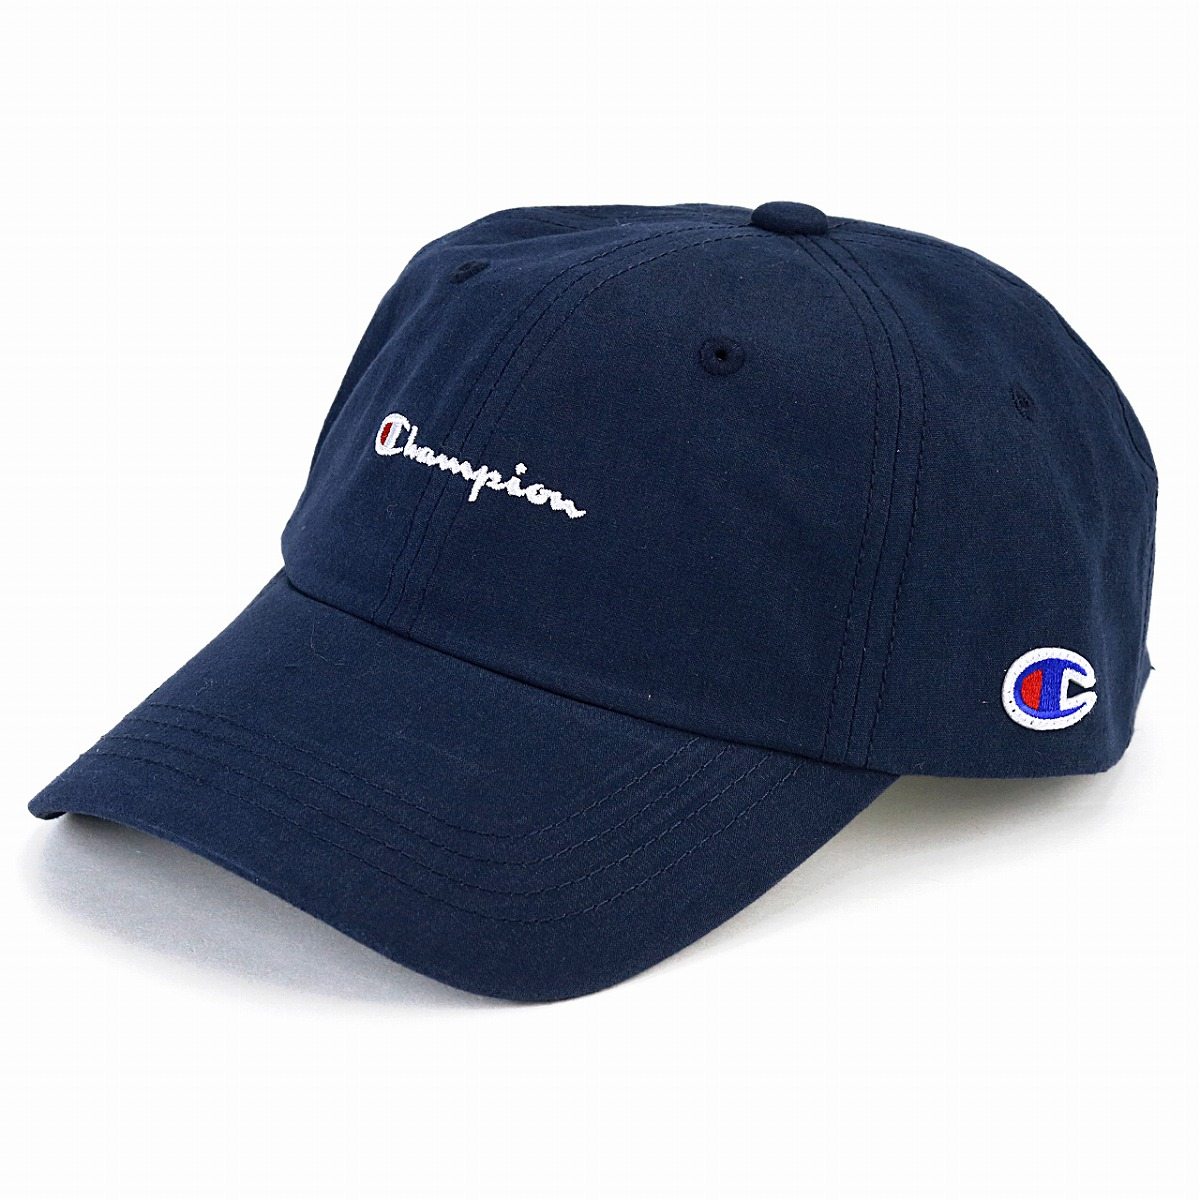 0e69264e223 Cap men champion logo cap champion low cap Lady s Shin pull plain casual  coordinates hat sports cap unisex adjustable size   dark blue navy   baseball cap  ...